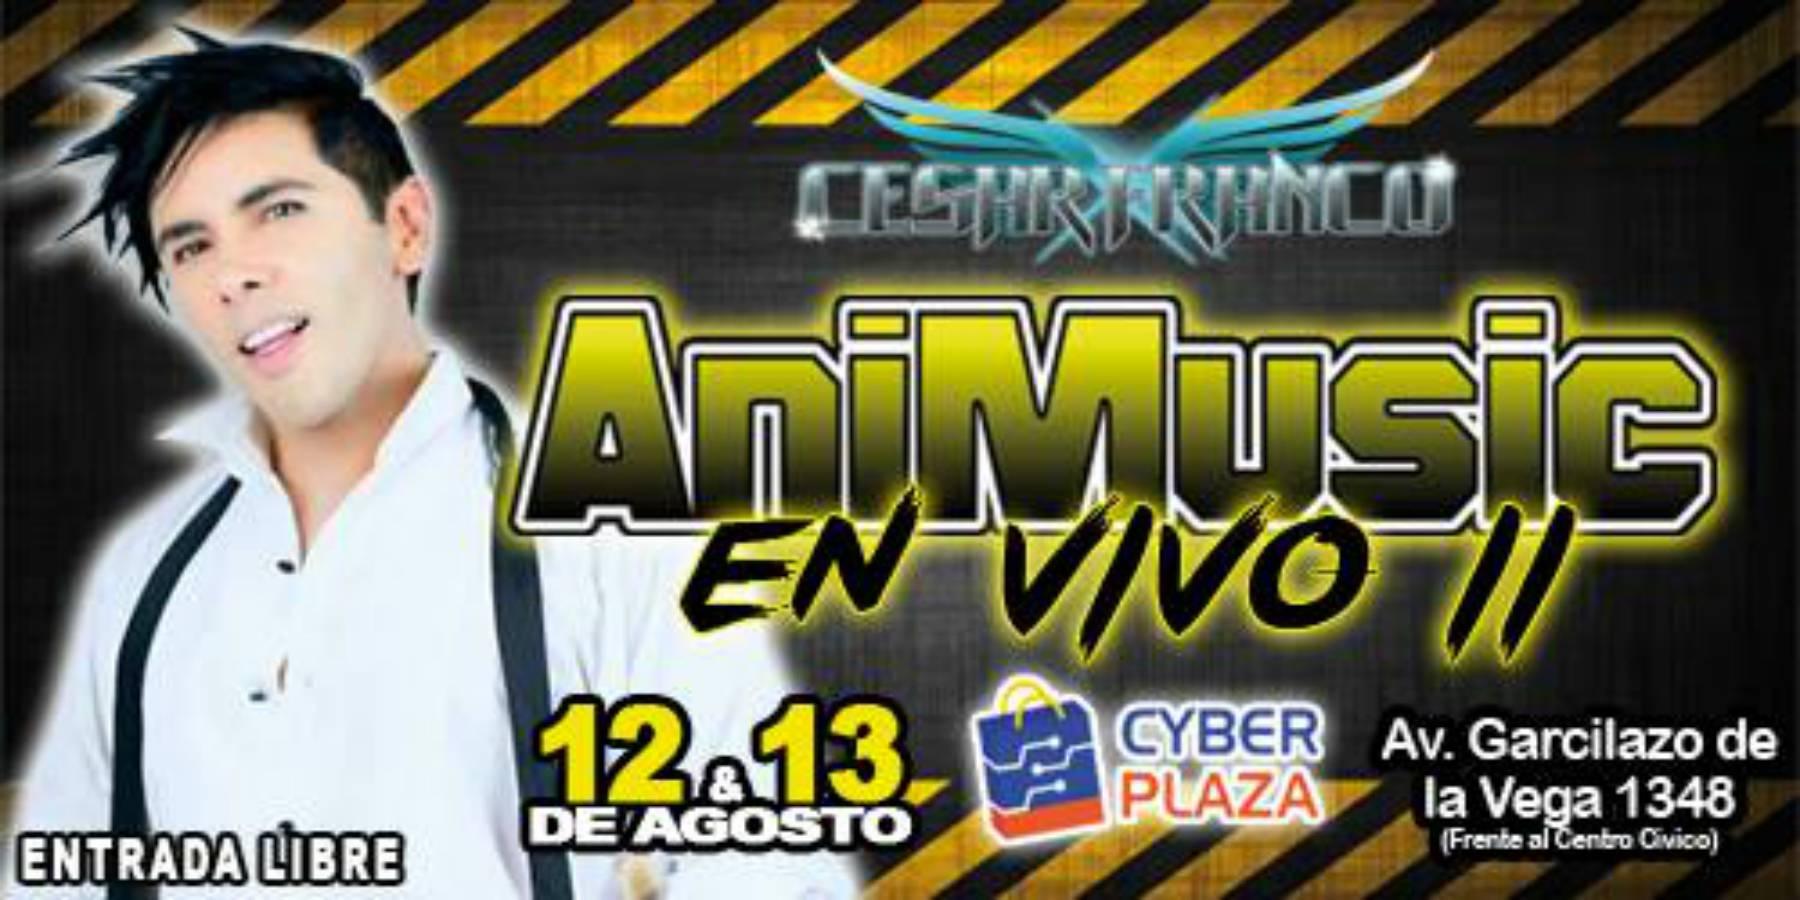 Animusic II | Cesar Franco regresa a Lima para reencuentro con fans